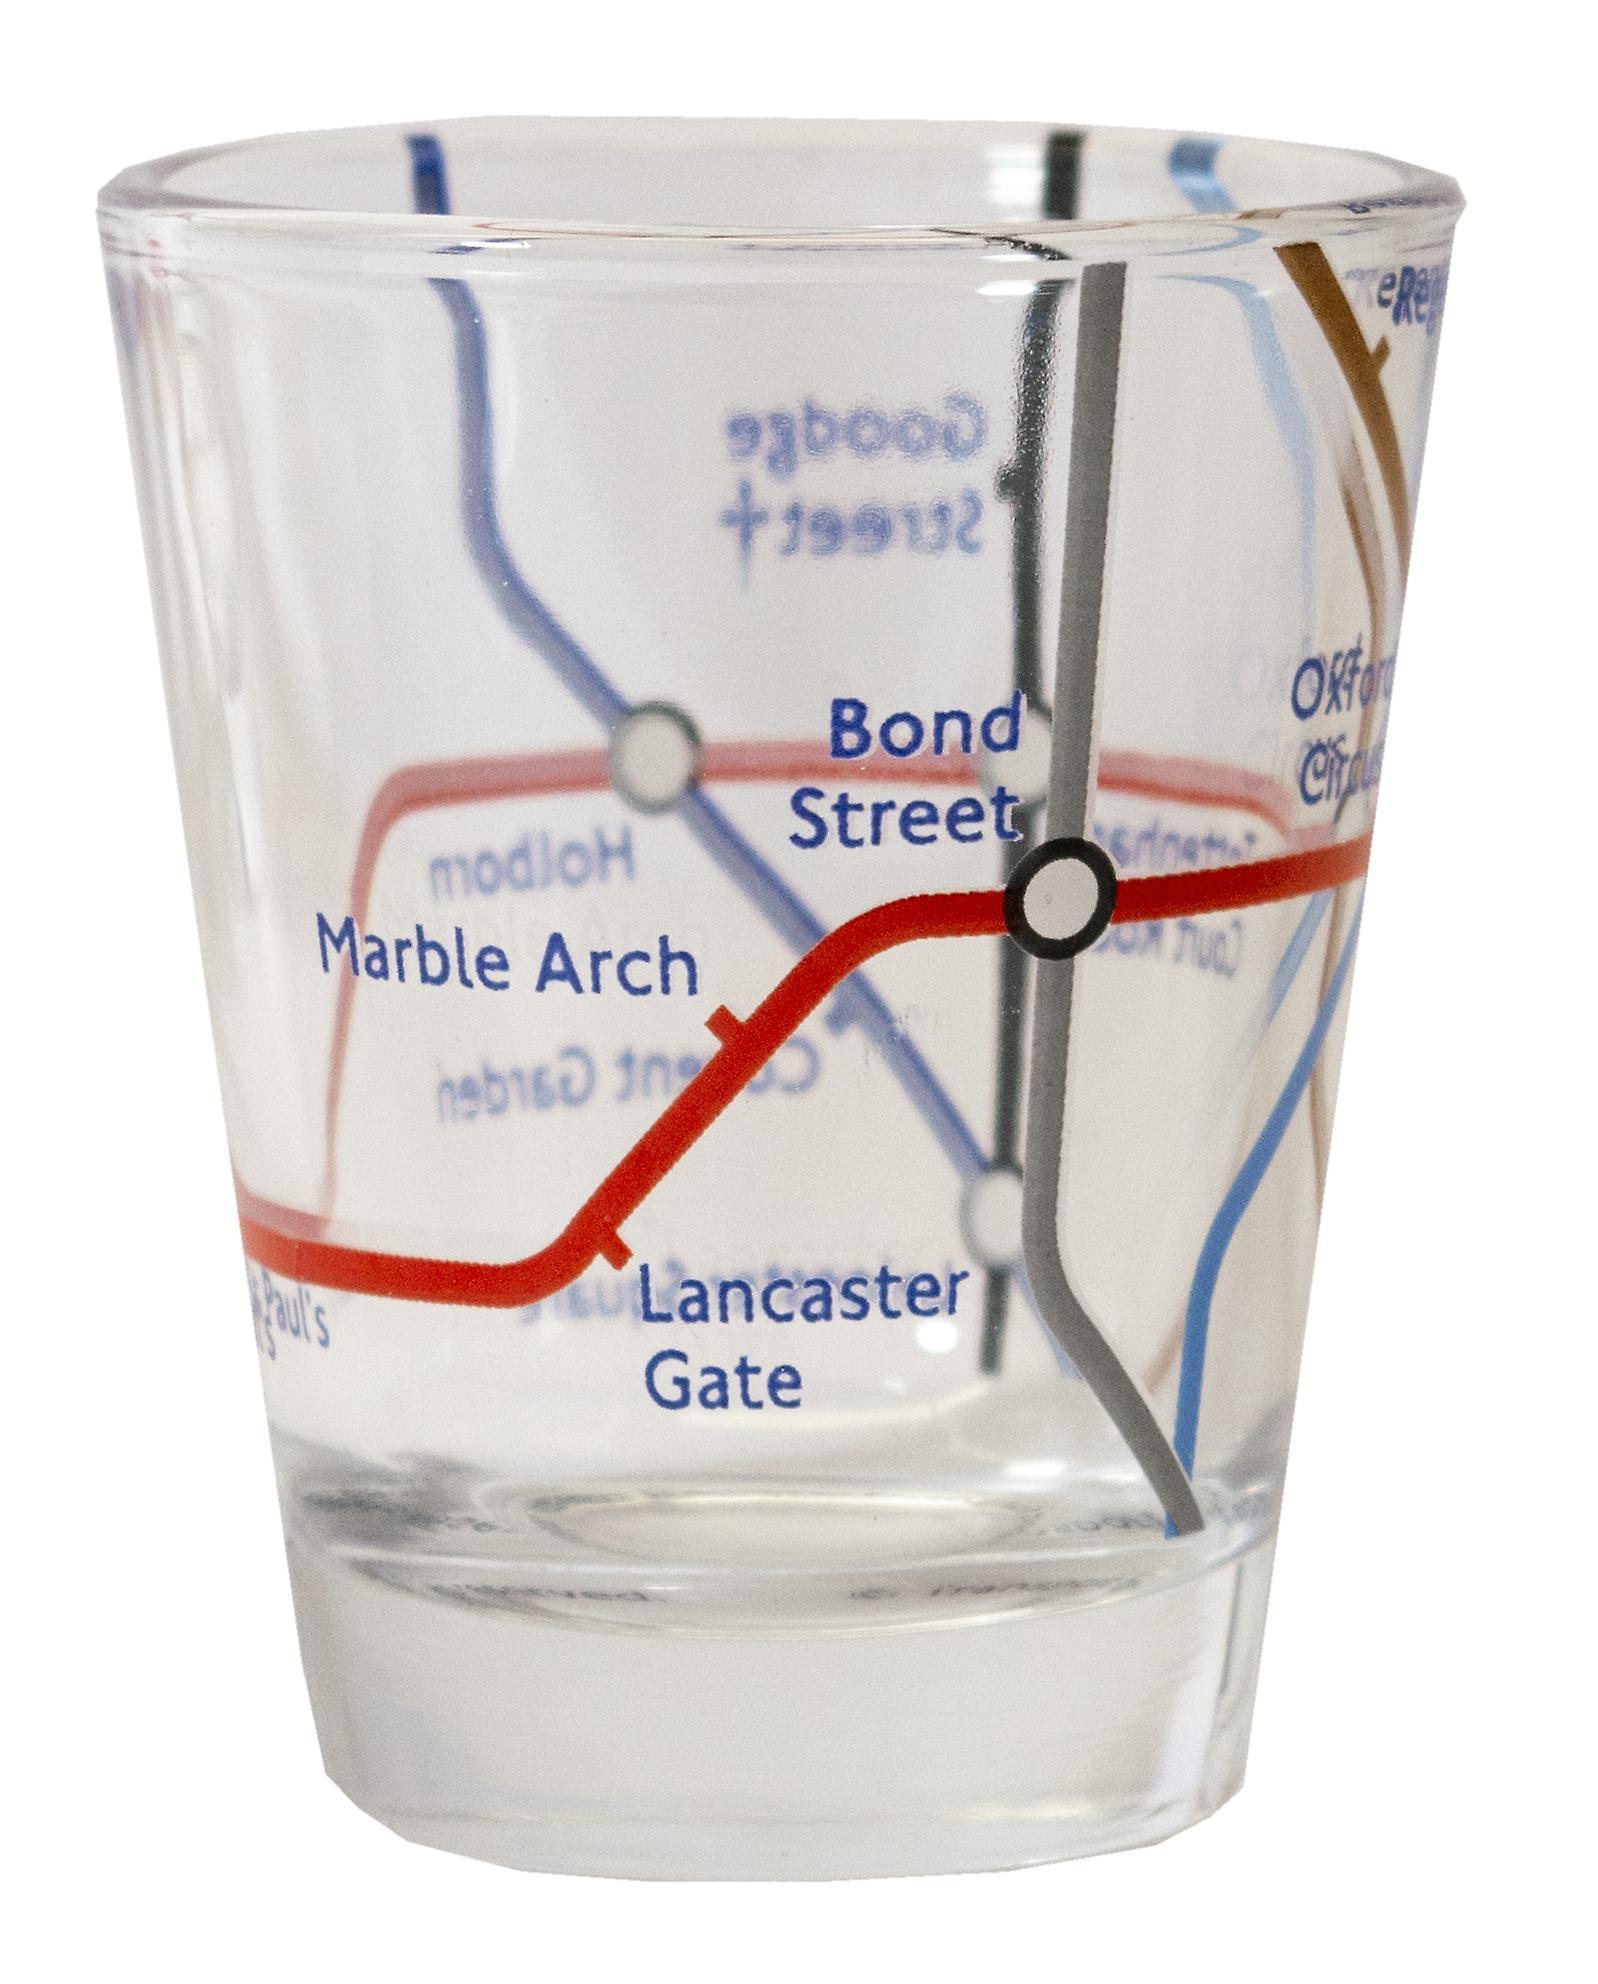 Licensed tfl underground tube map london set of 3 shot glasses